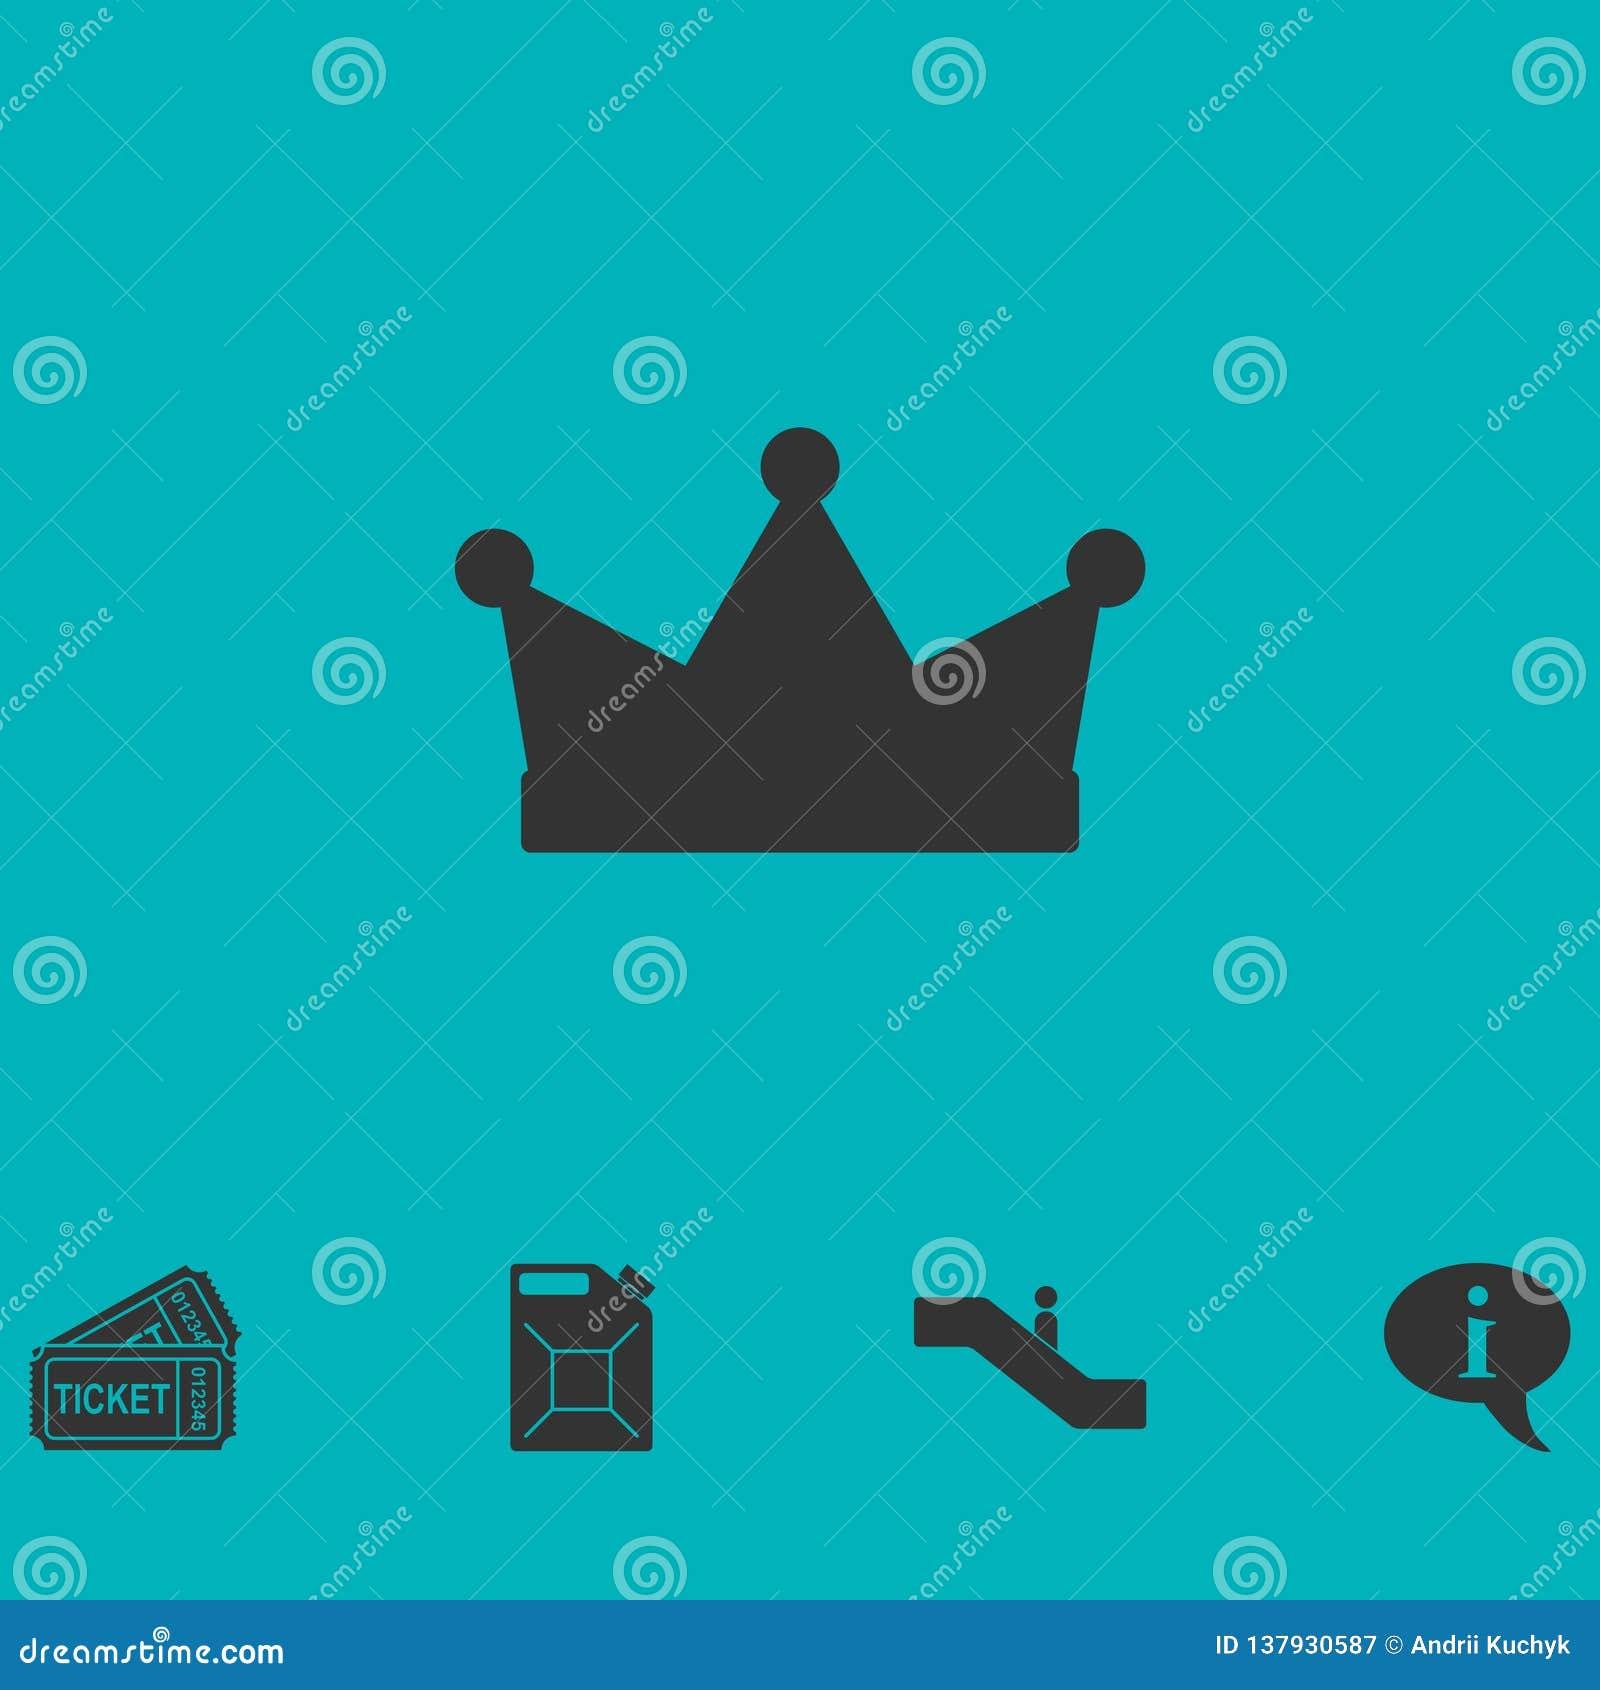 Crown icon flat